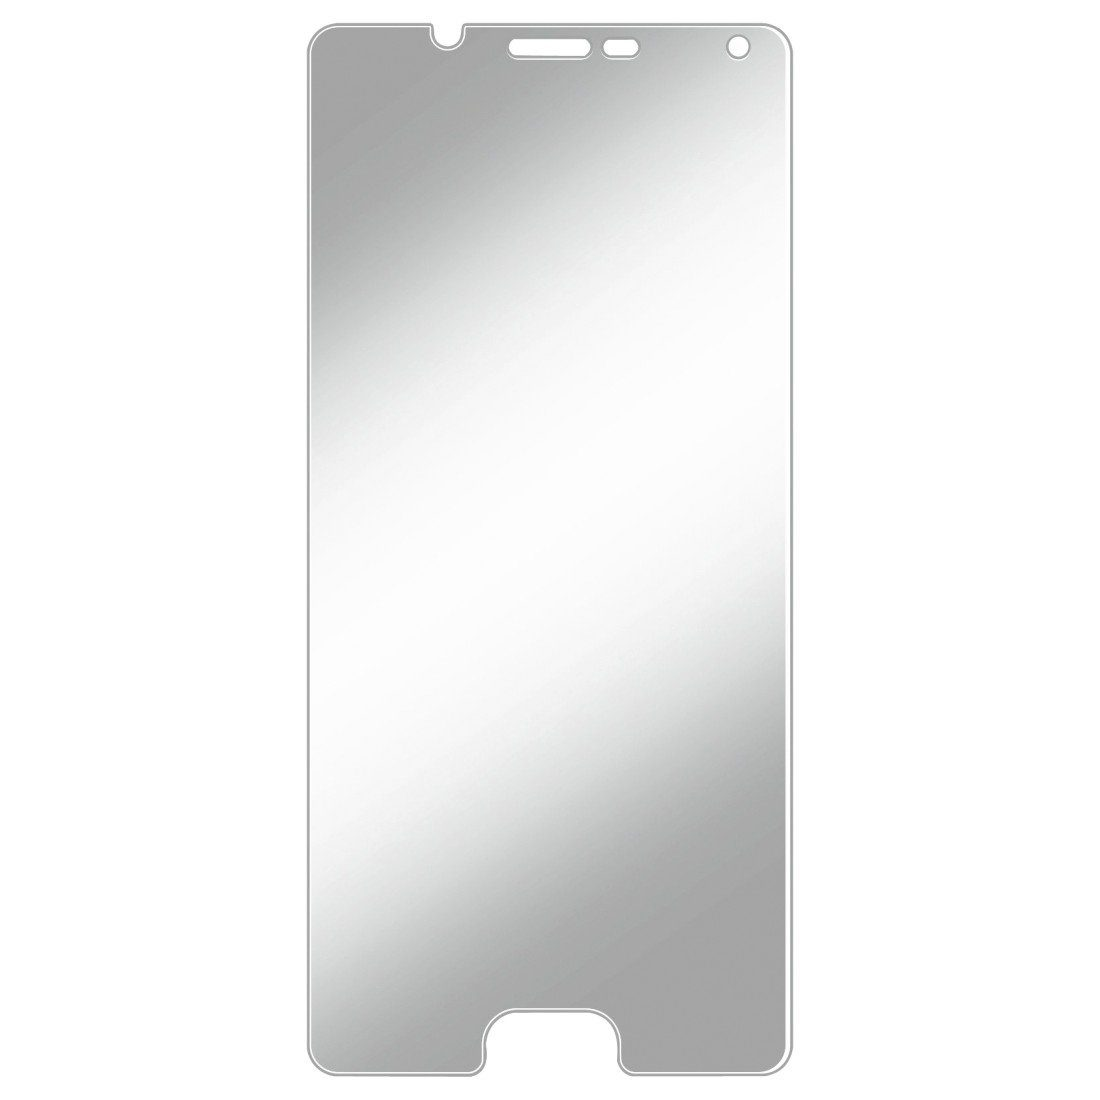 Hama Display-Schutzfolie Crystal Clear für Wiko U Feel, 2 Stück